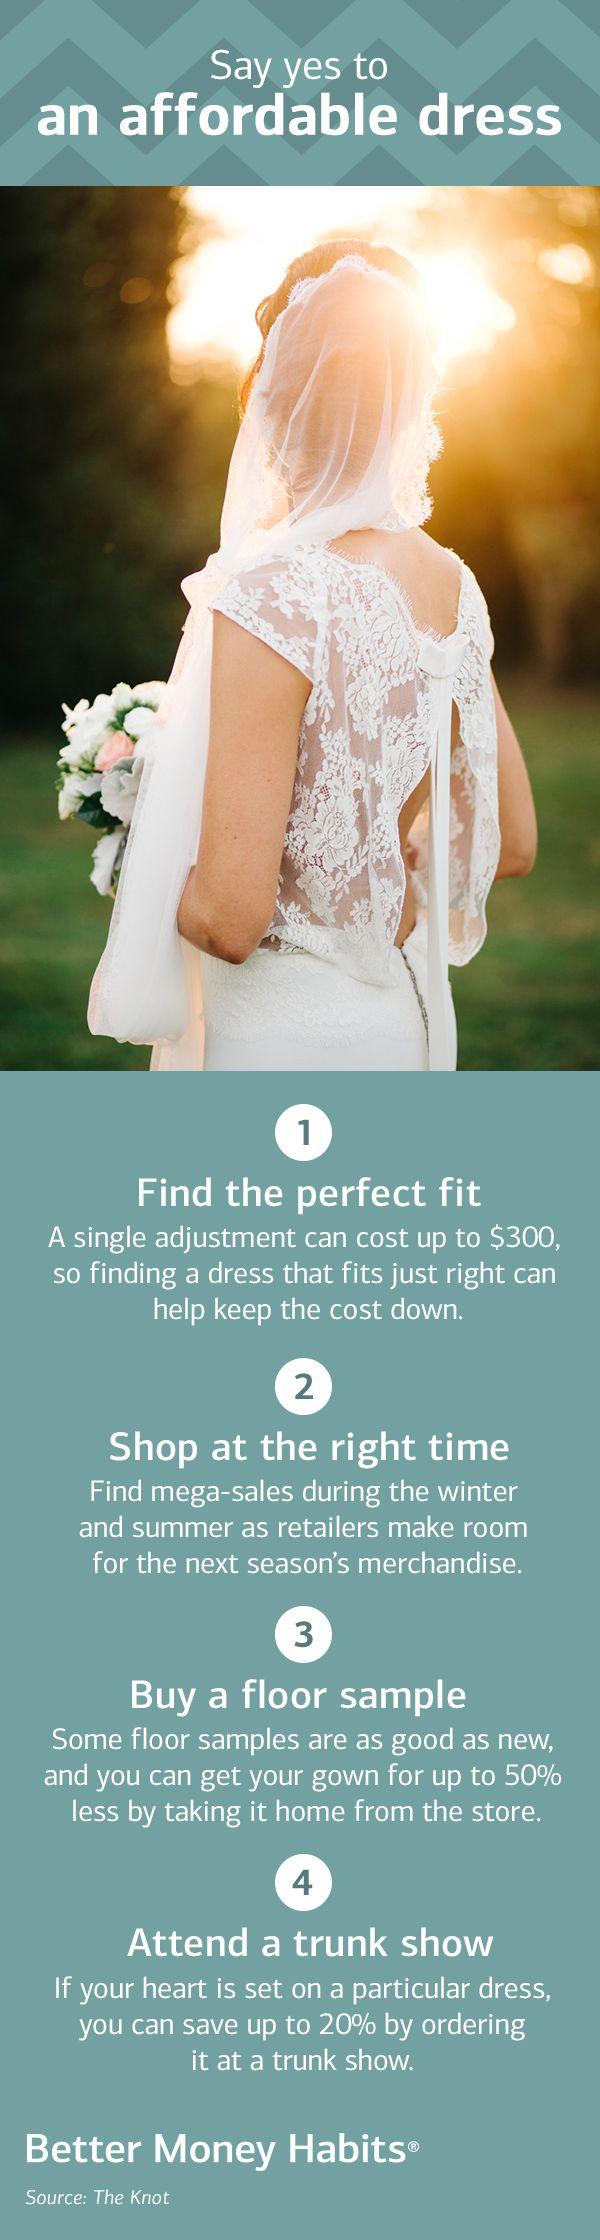 37 best Wedding Planning images on Pinterest | Planning a wedding ...